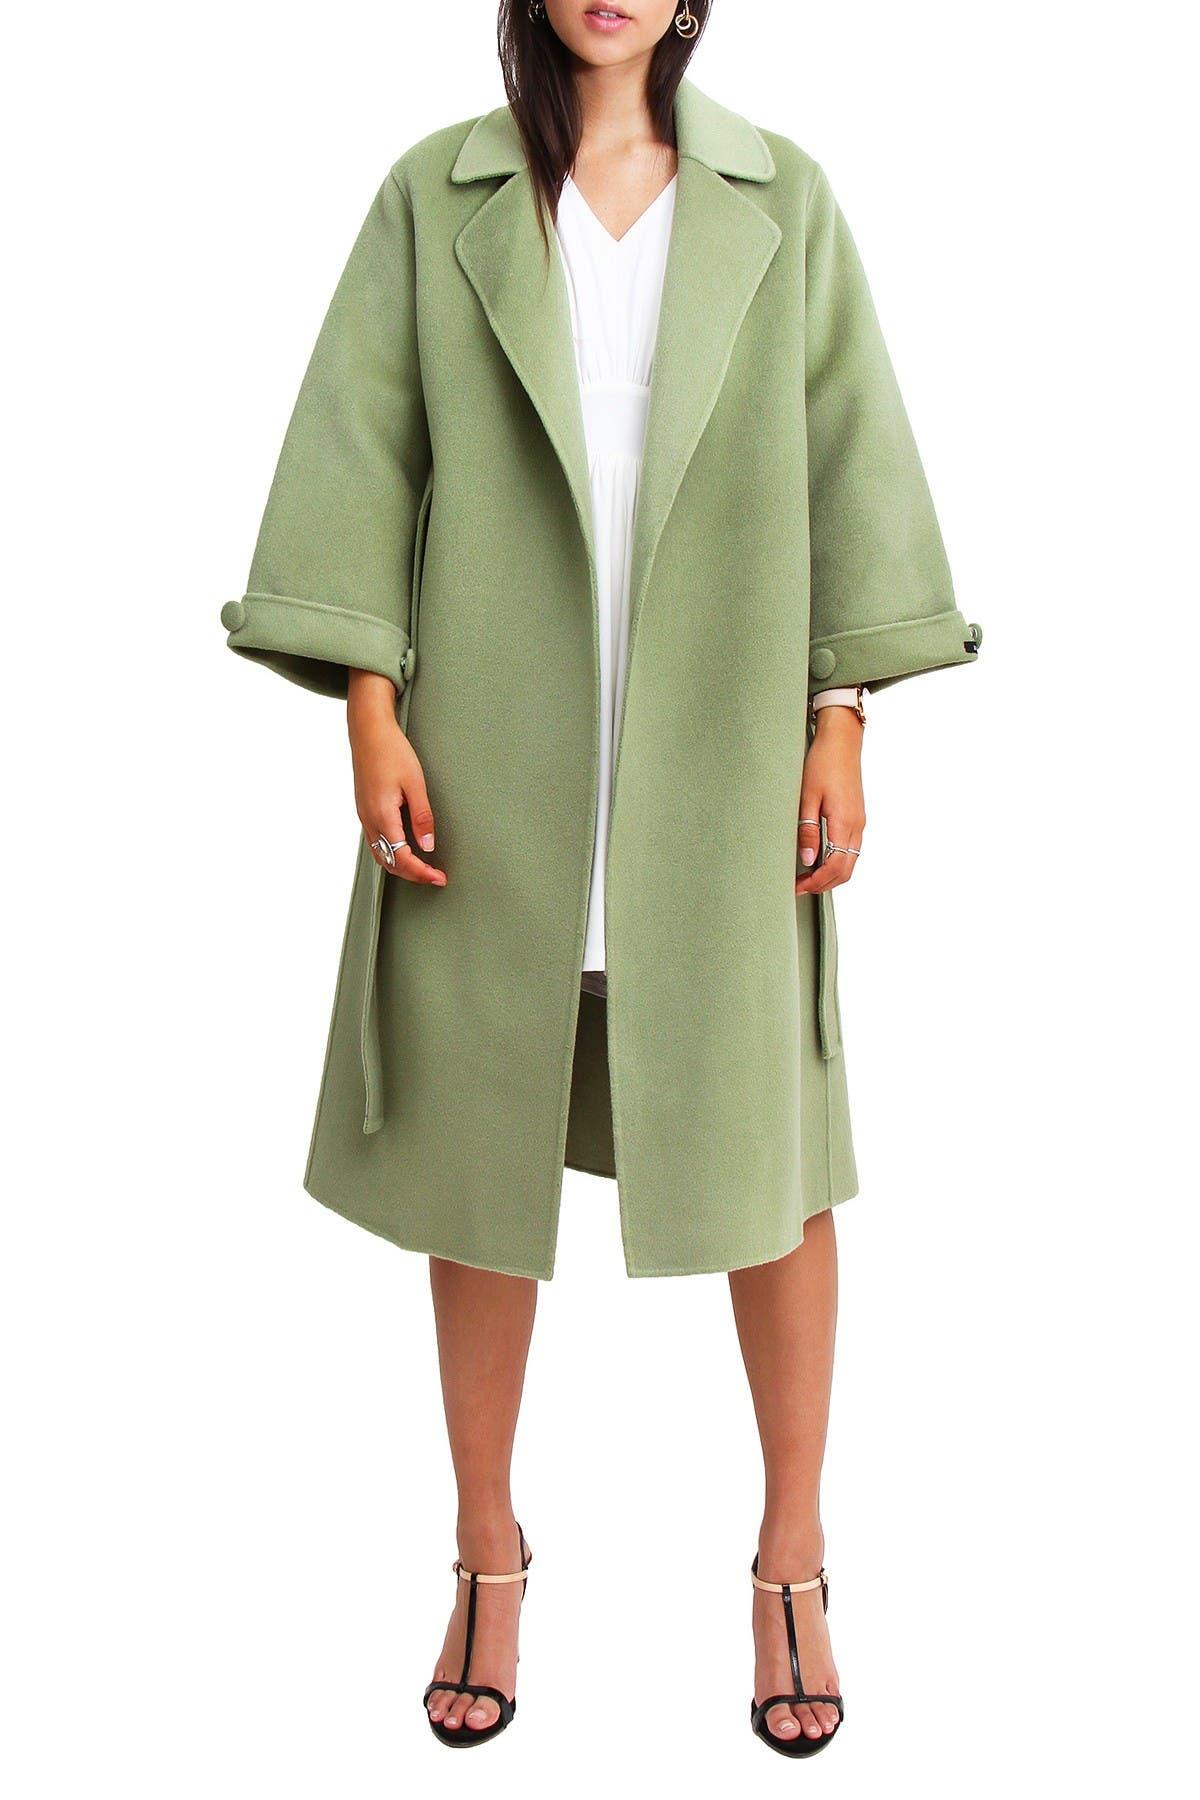 Image of Belle & Bloom Stay Wild Wool Coat